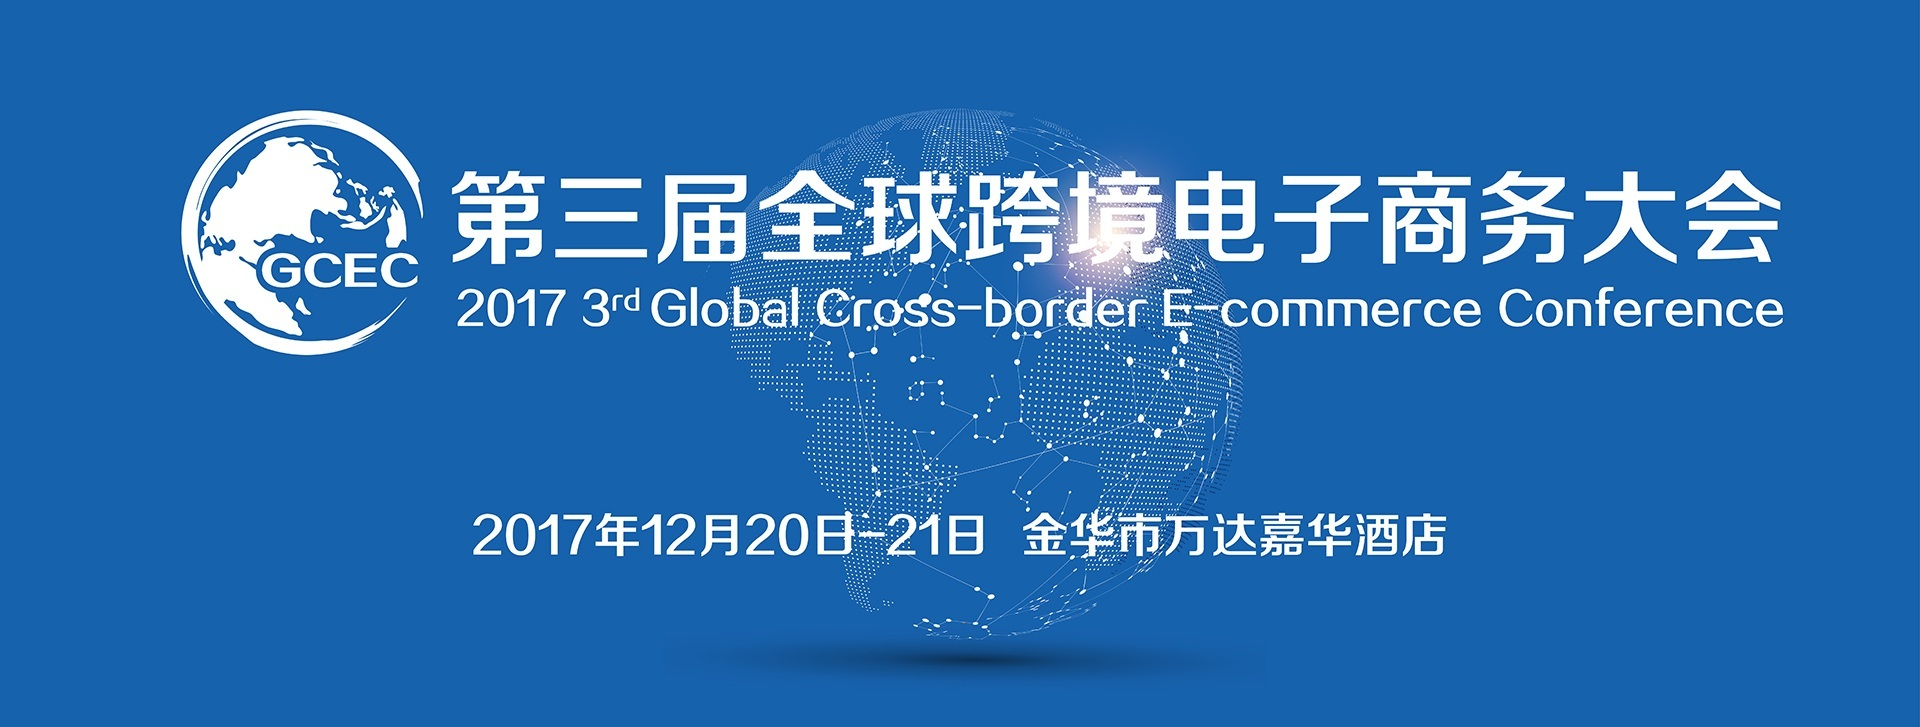 GCEC2017第三届全球跨境电子商务大会